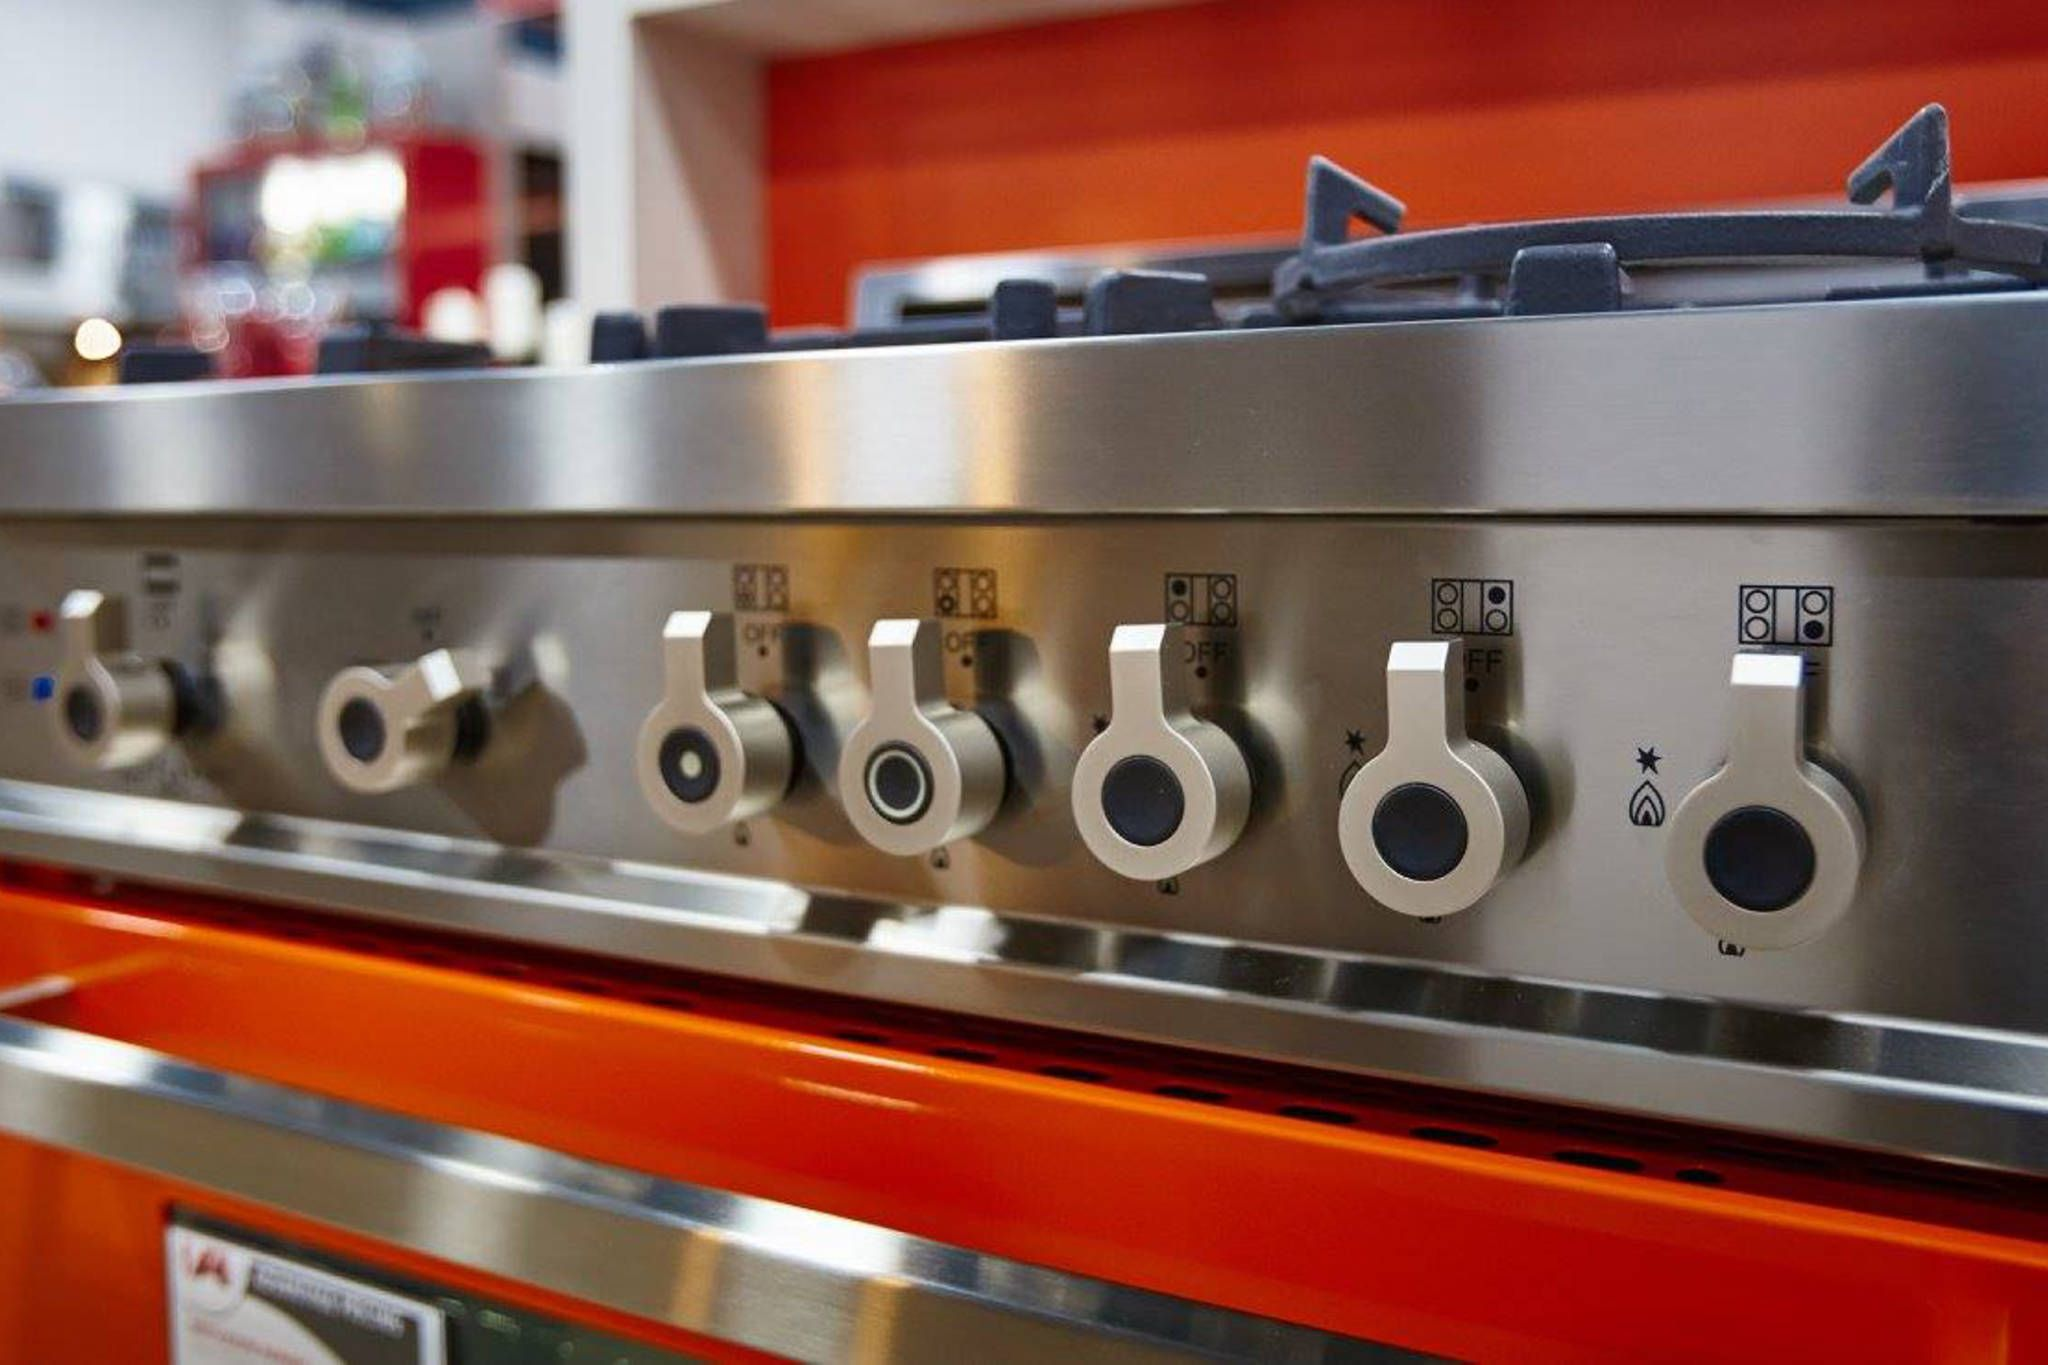 Cheap Appliances Toronto Cheap Appliances Appliances Home Kitchens